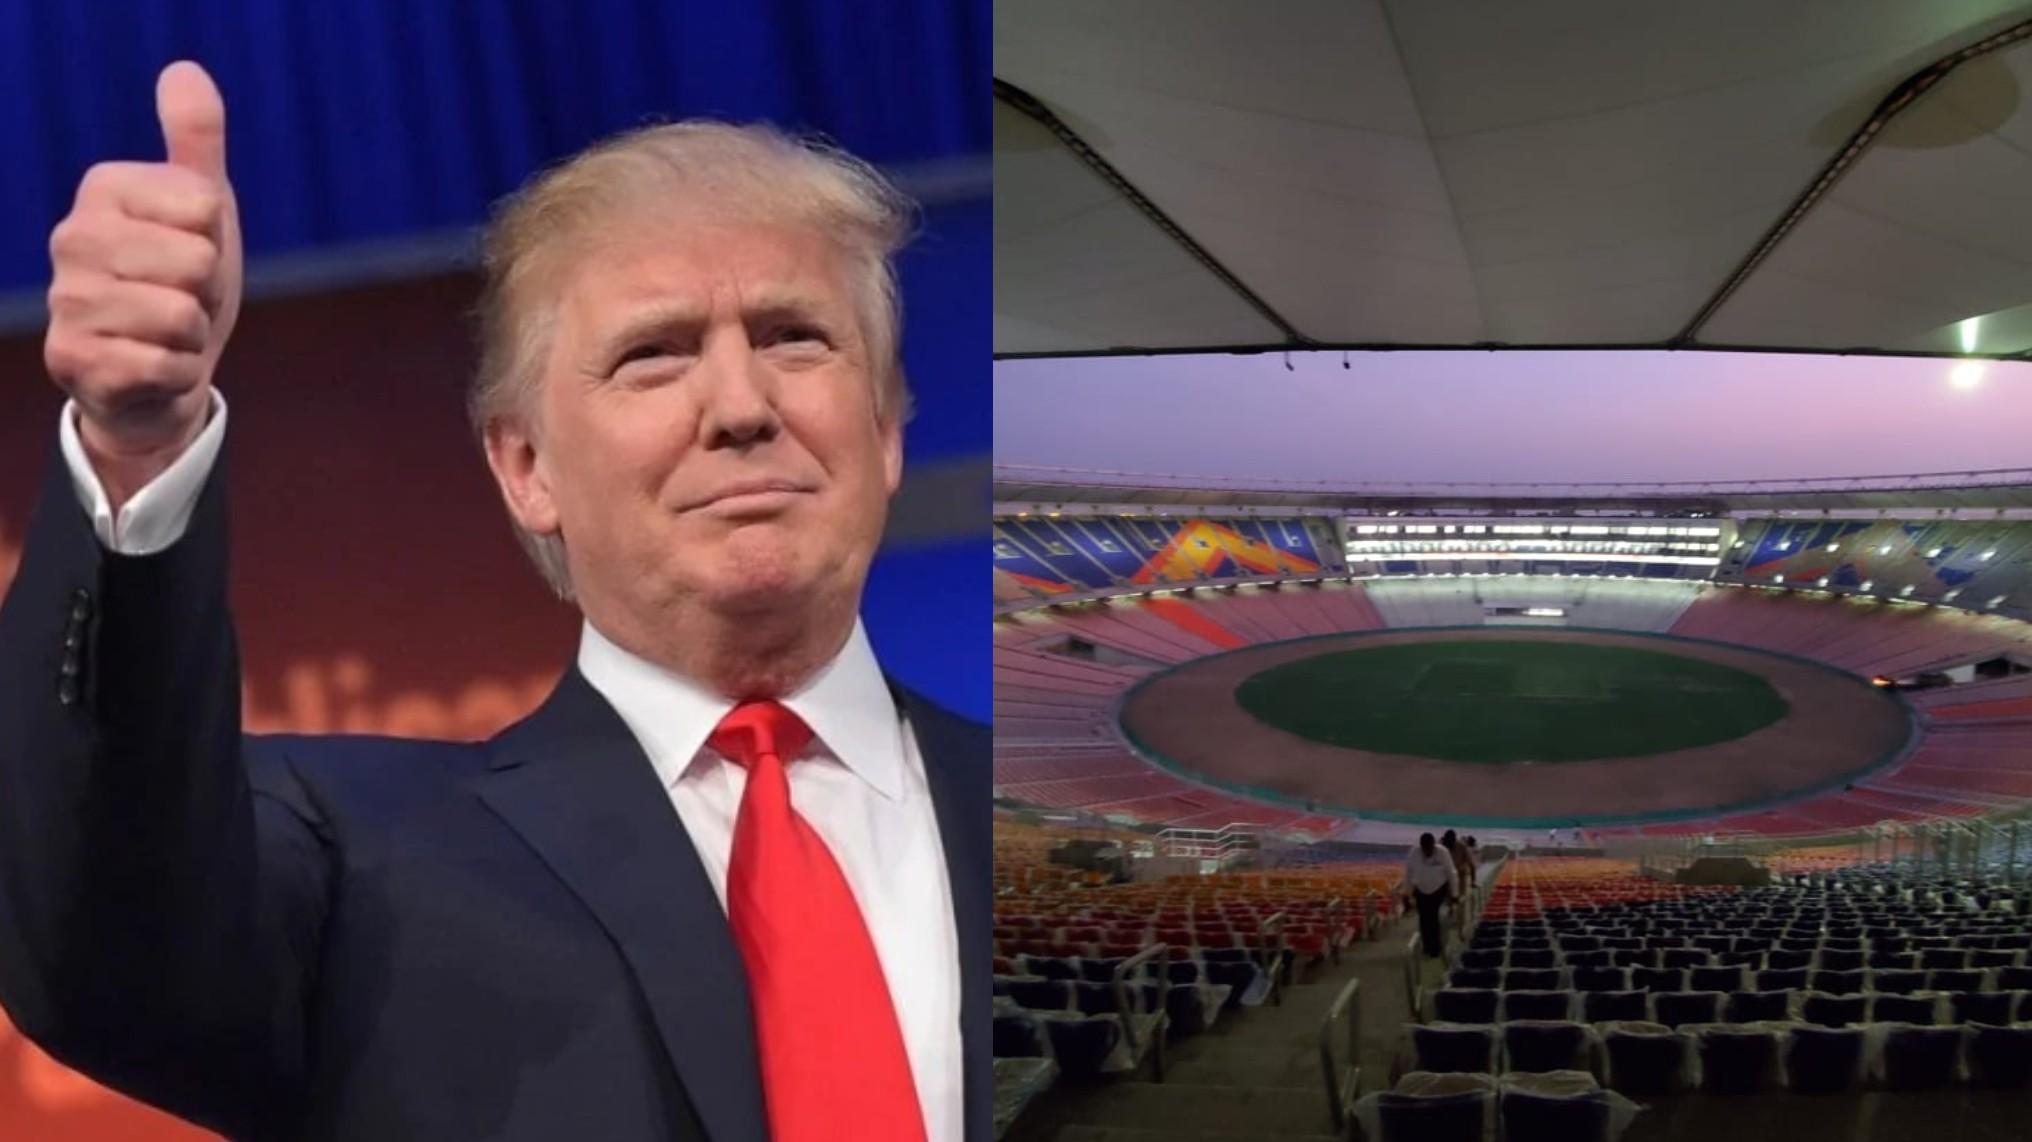 US President Donald Trump to inaugurate new Sardar Patel Stadium in Motera